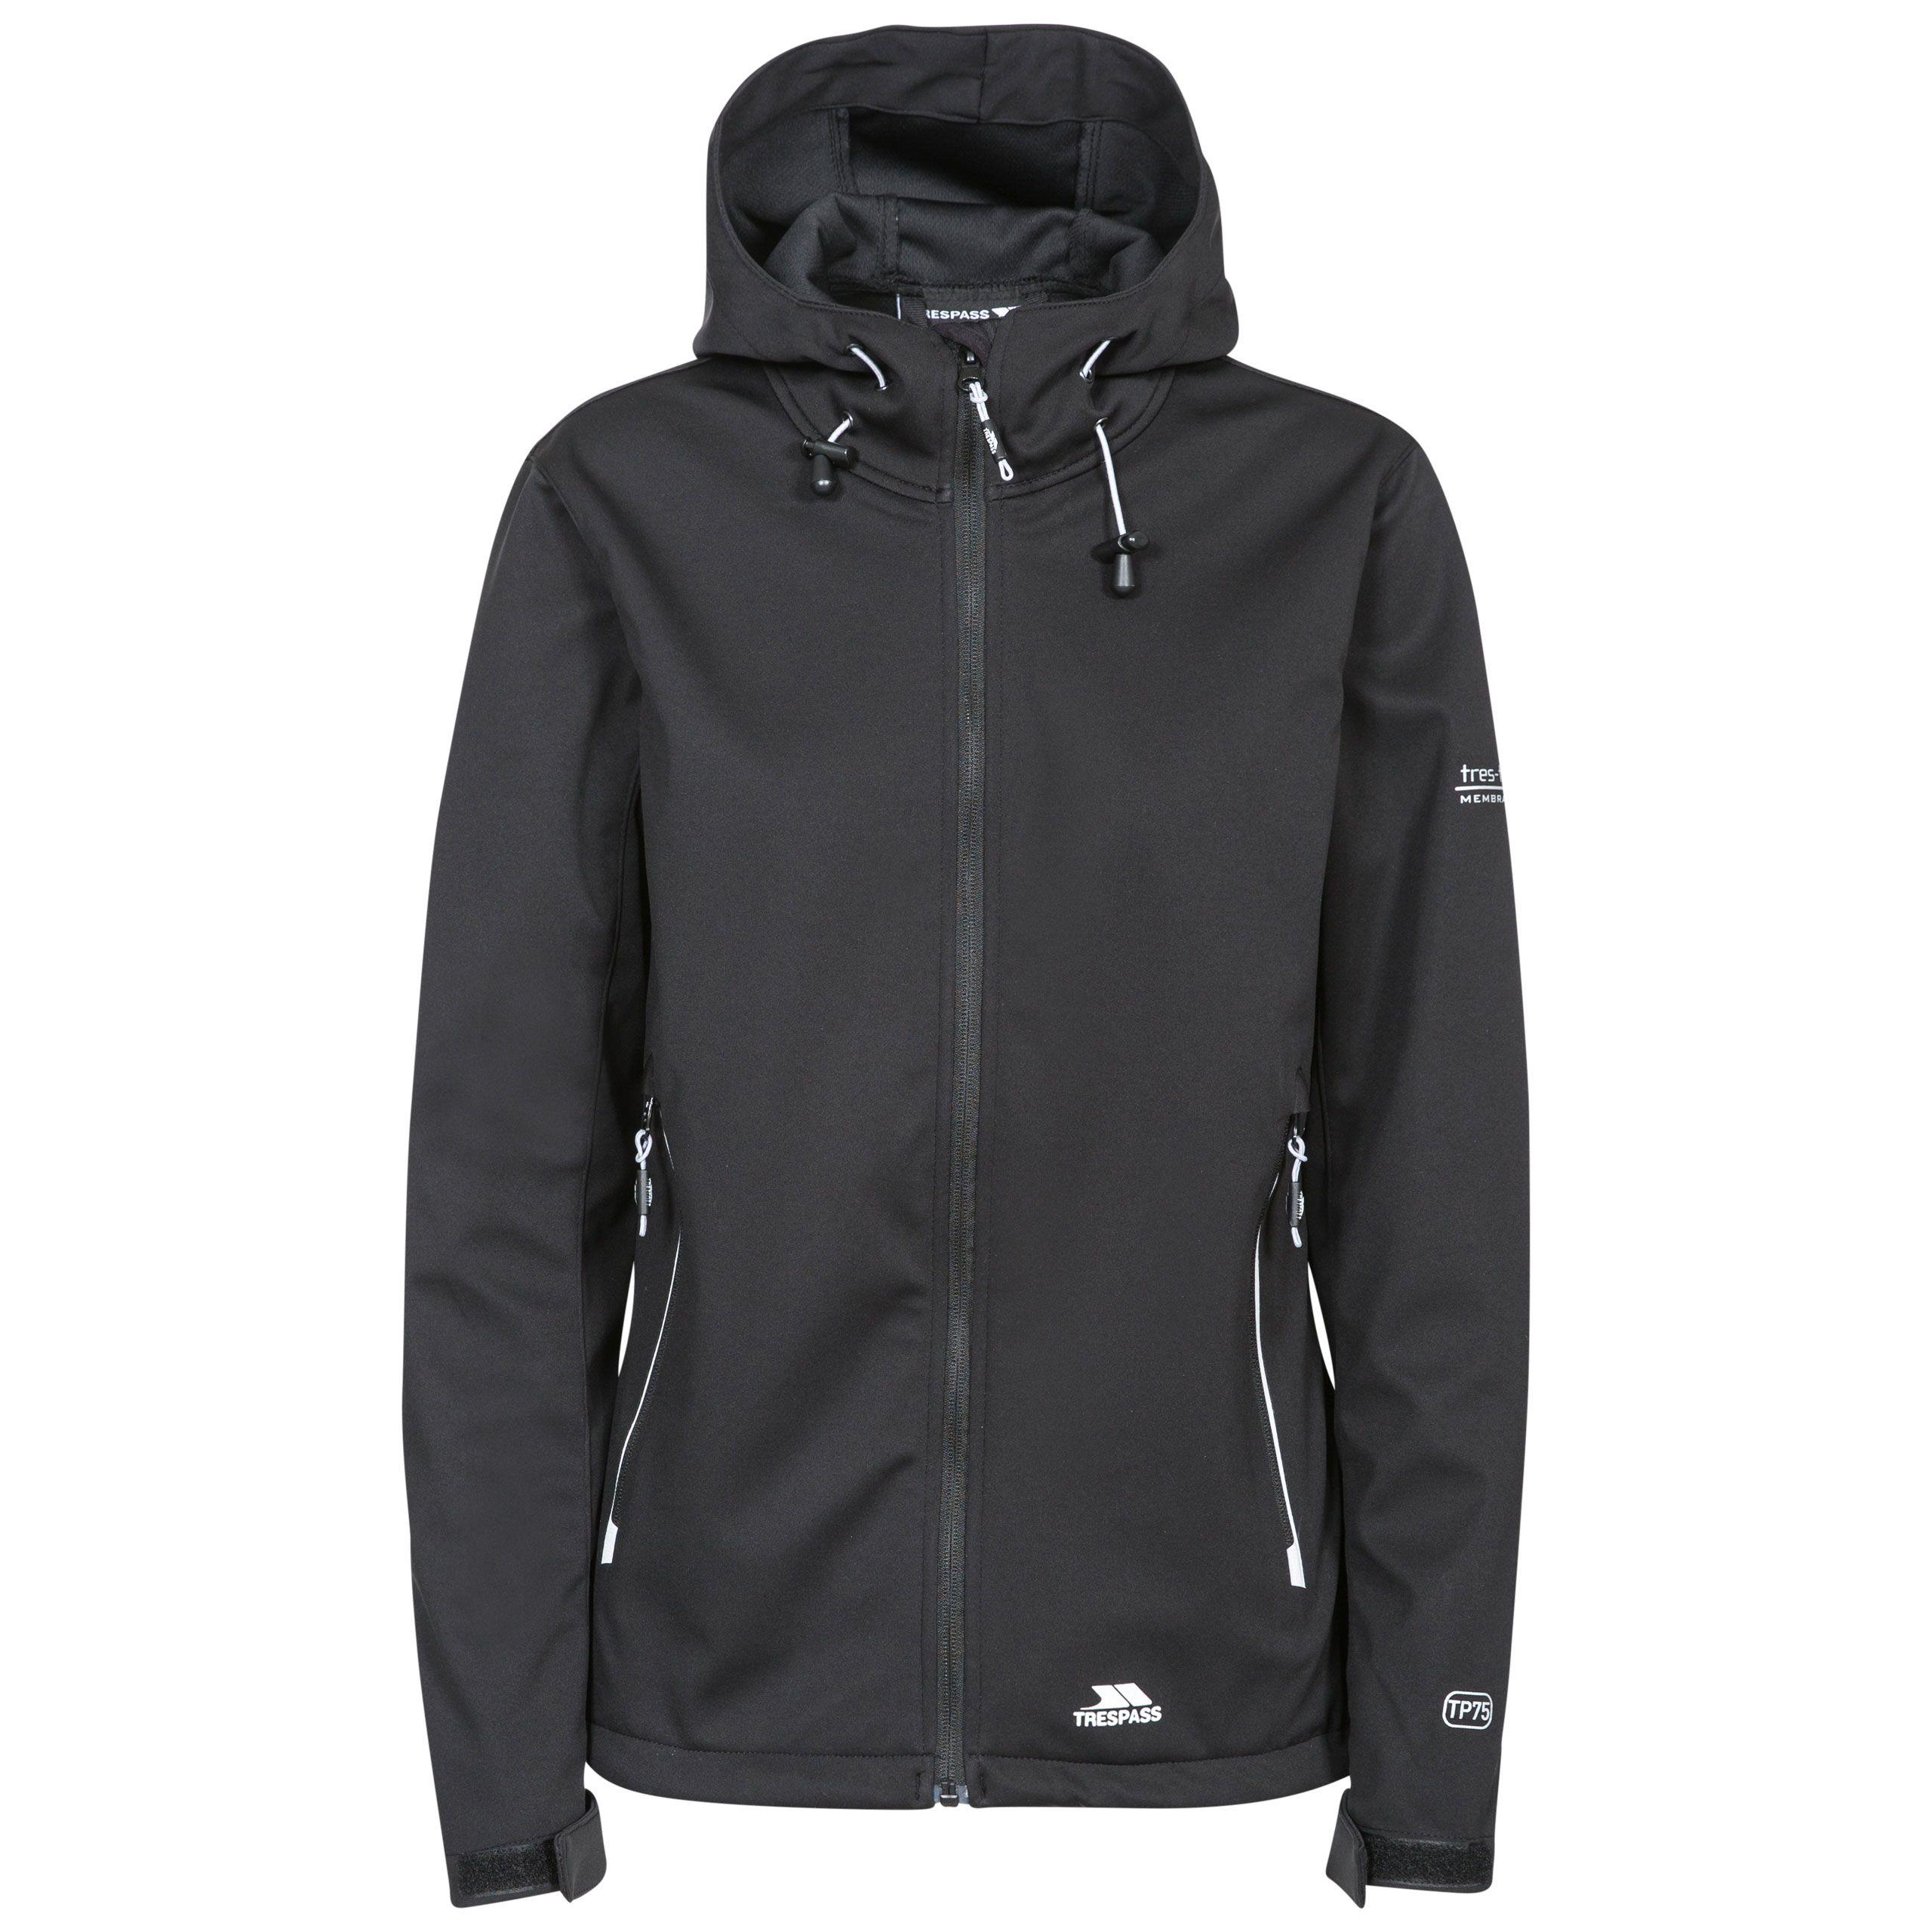 Marsa Womens Breathable Hooded Softshell Jacket